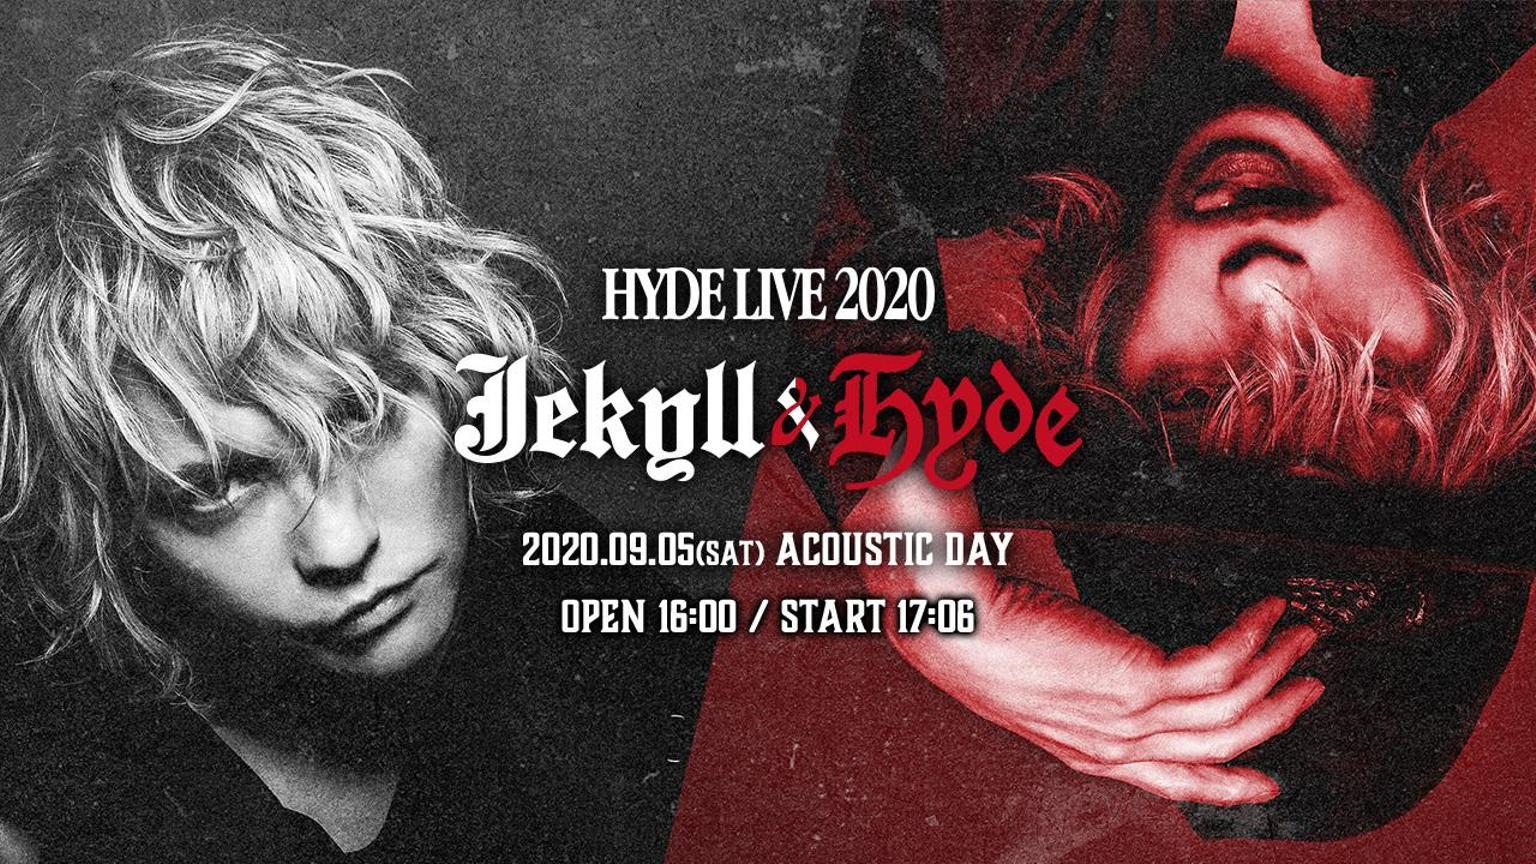 HYDE LIVE 2020 Jekyll & Hyde